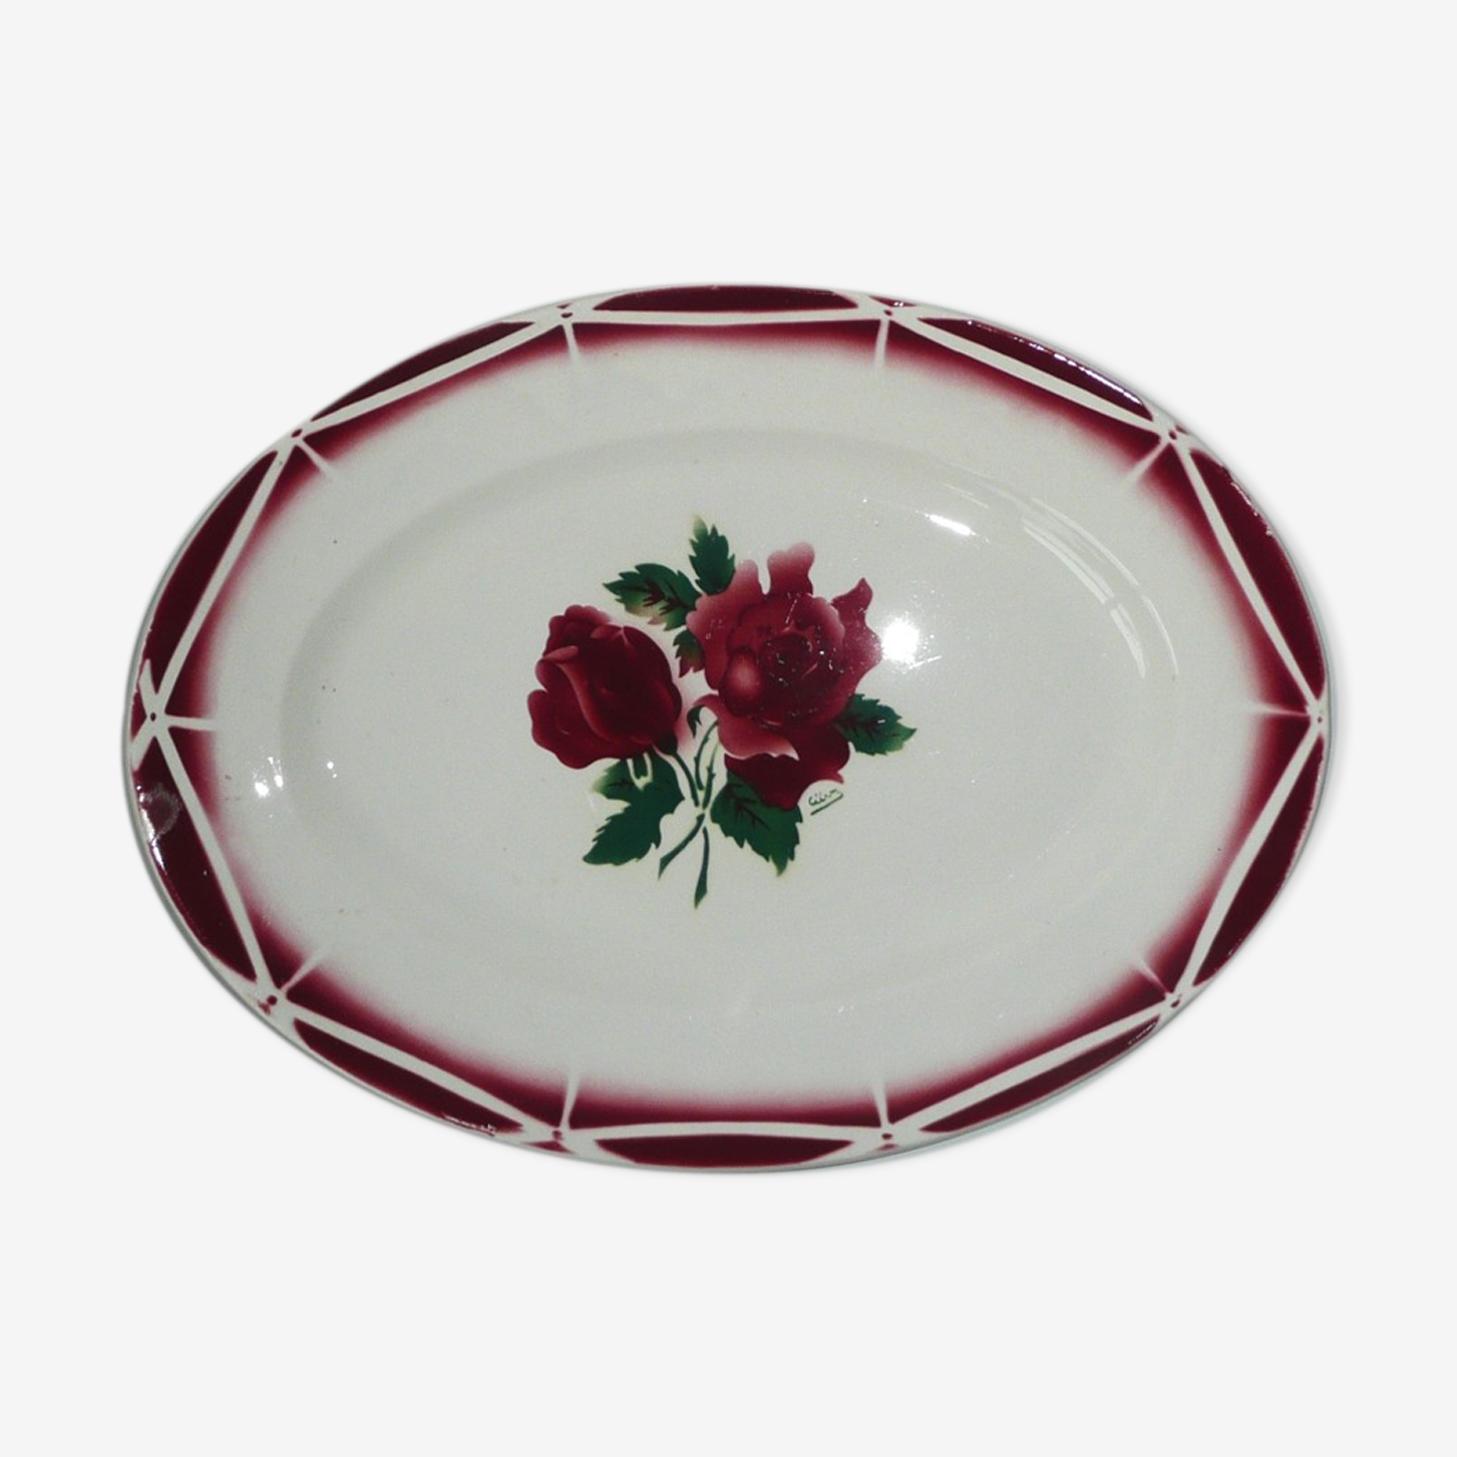 Plat de service ovale Digoin motif roses